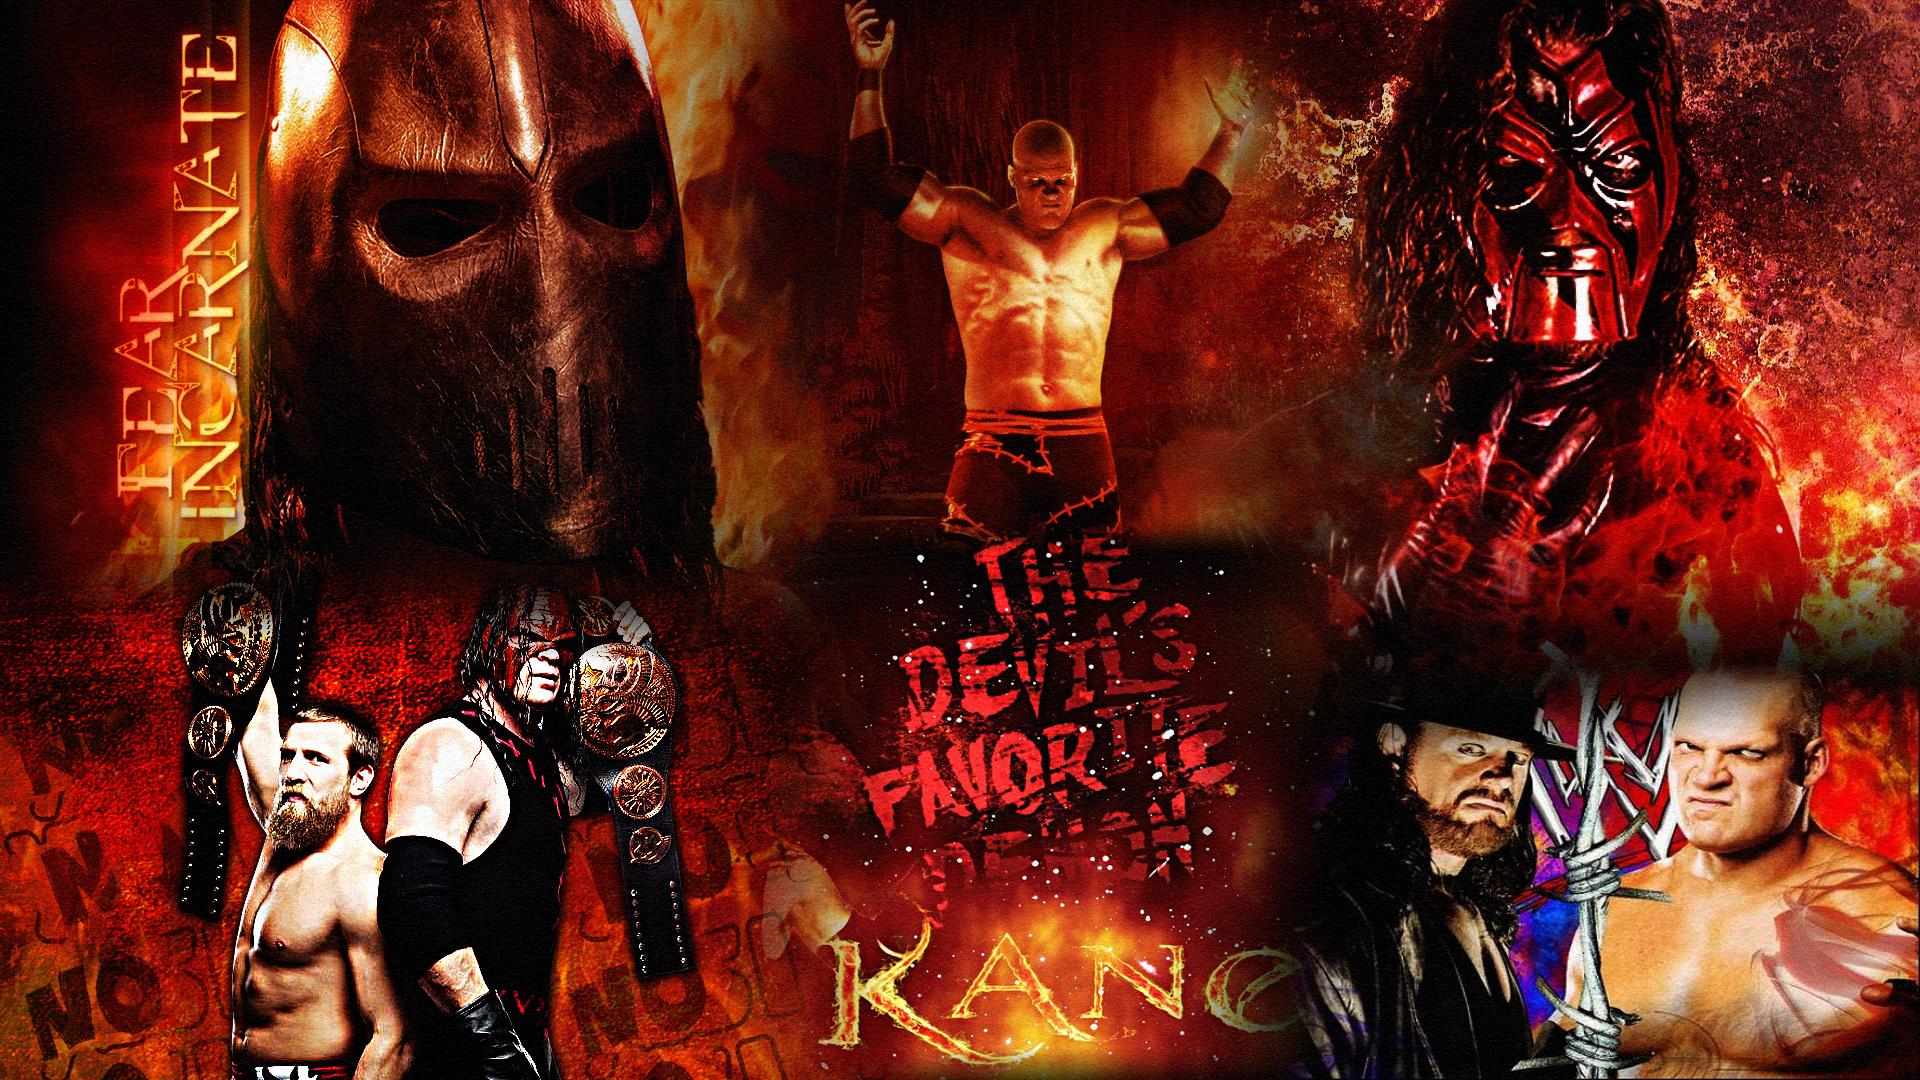 Kane WWE Wallpaper By Angelus23 On DeviantArt